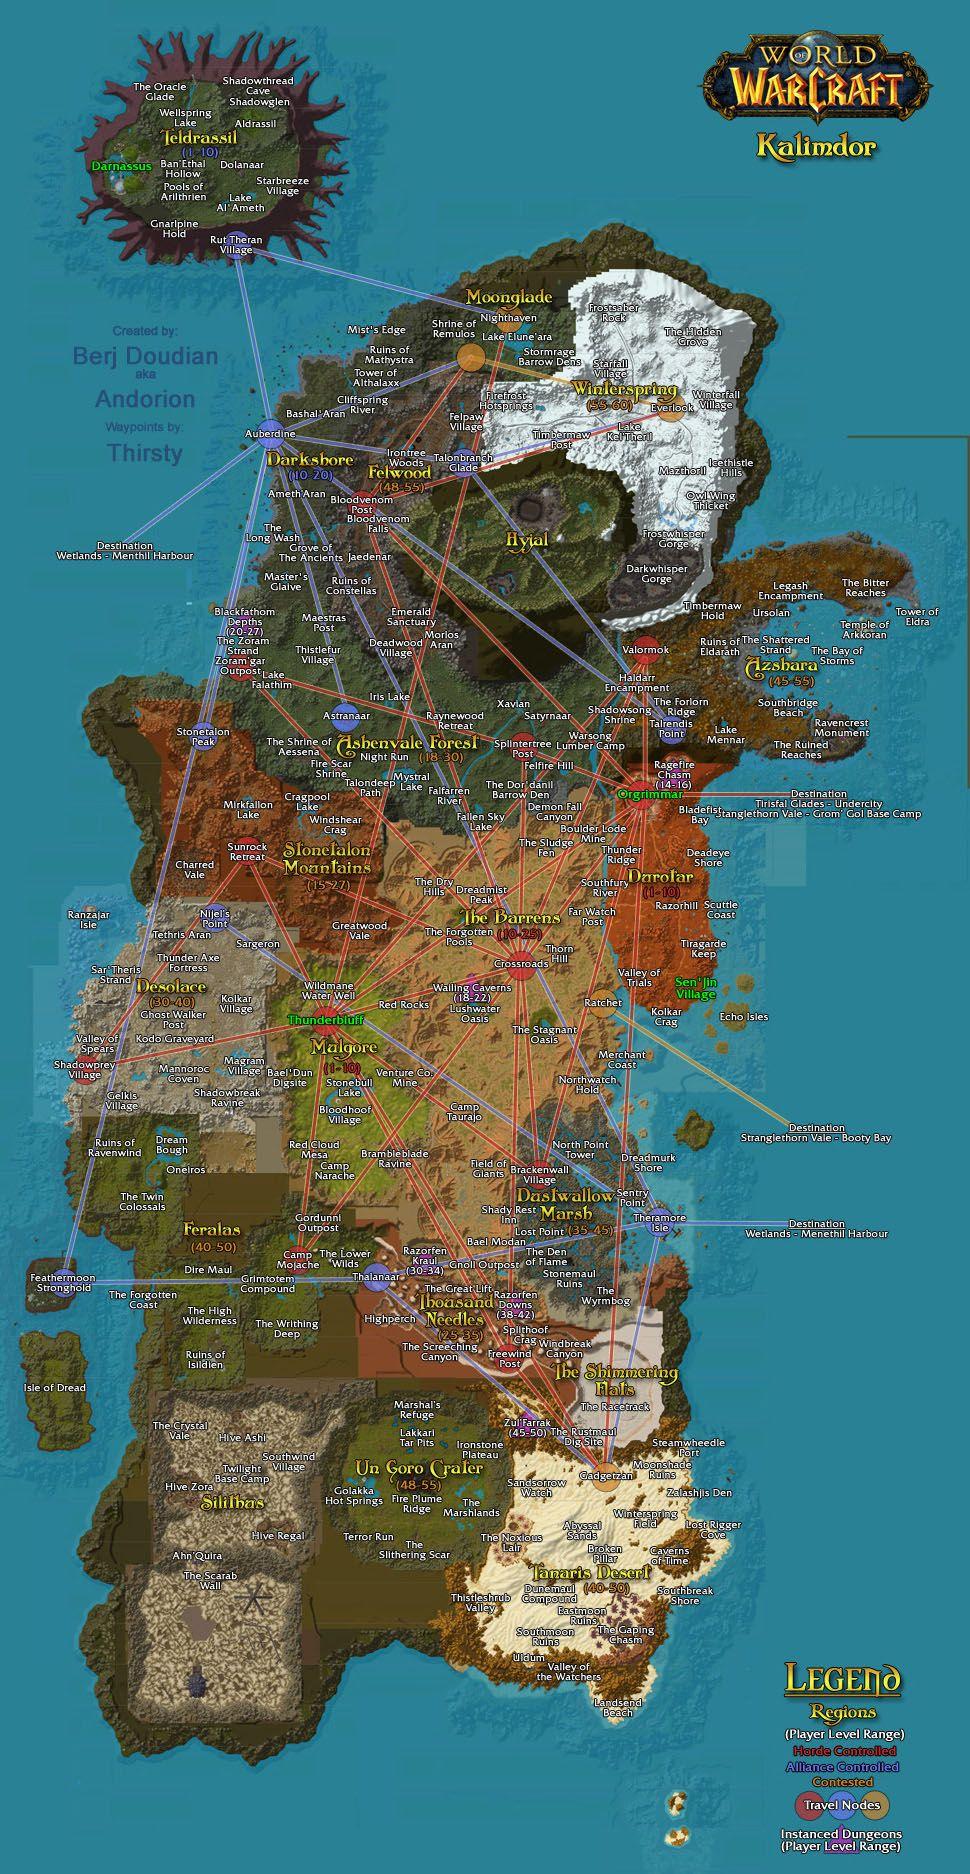 Eastern Kingdoms Map : eastern, kingdoms, Flight, Paths, Eastern, Kingdoms, Kalimdor, World, Warcraft